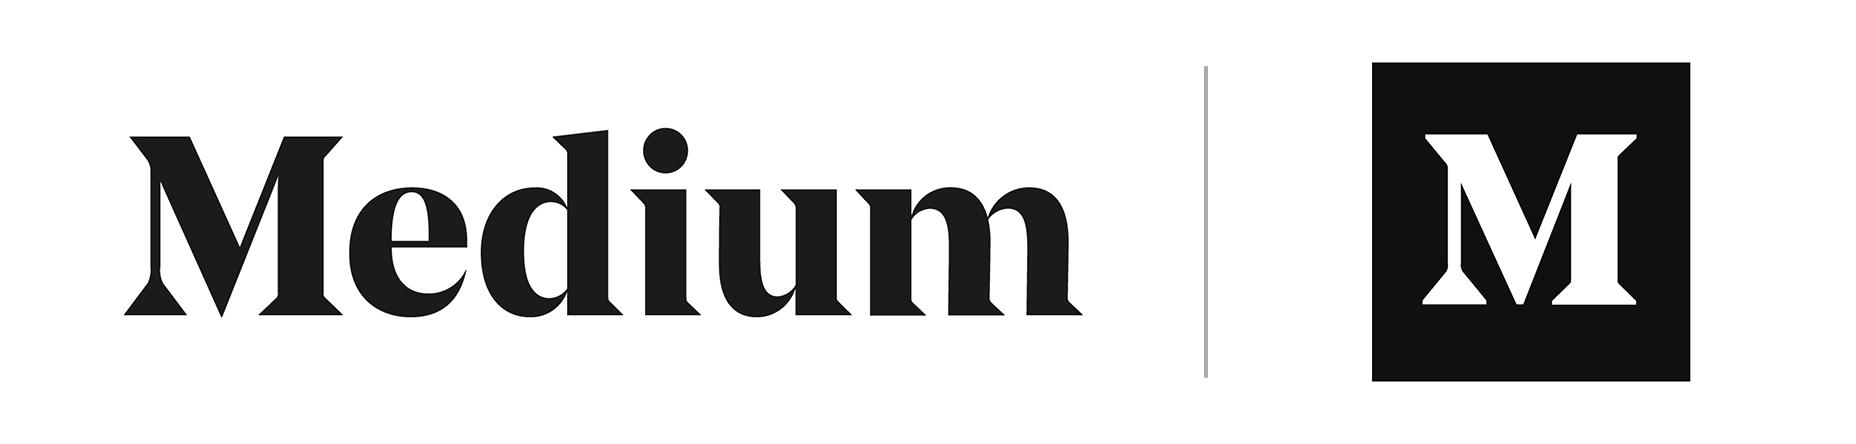 logotipo-monograma